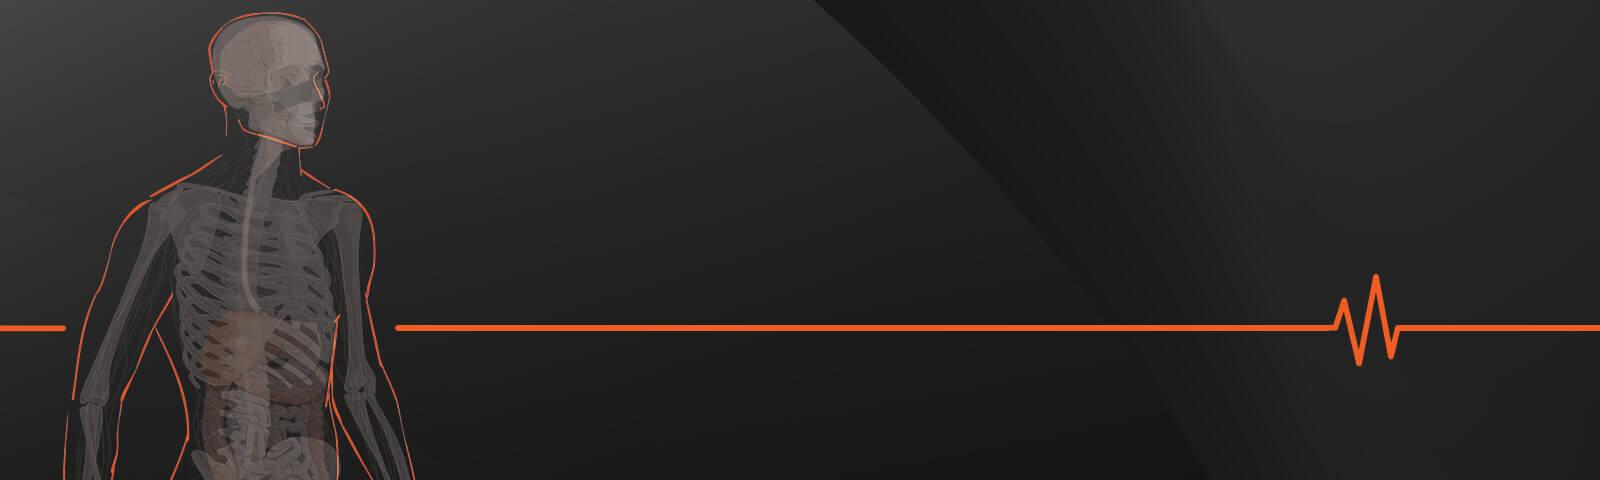 Vertiv Official Web Site